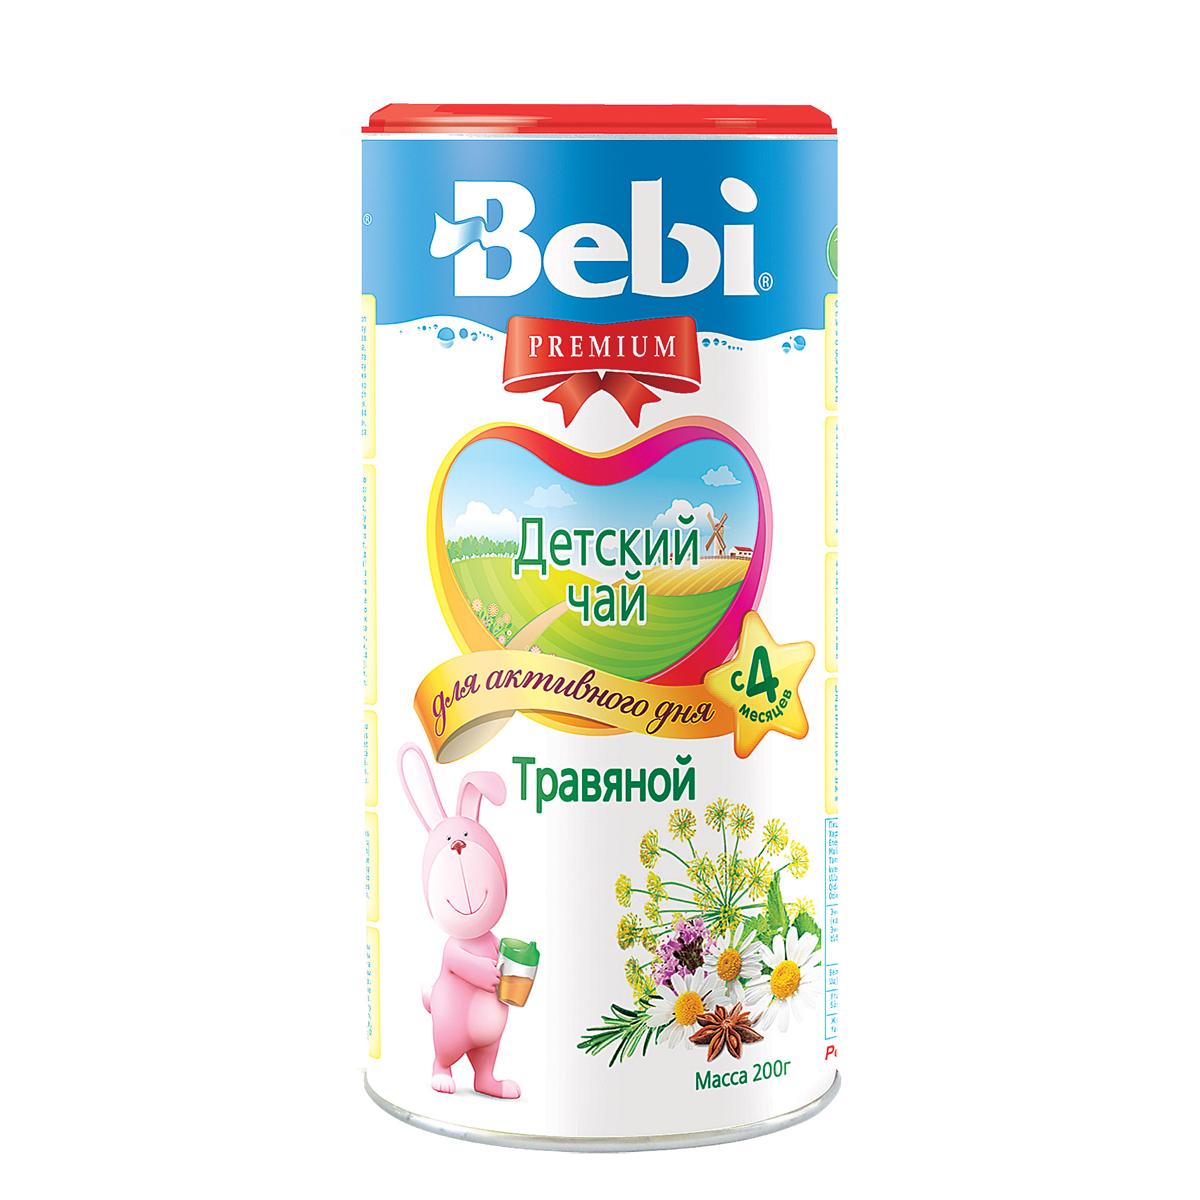 ��� ������� Bebi Premium ���������� 200 �� �������� (� 4 ���)